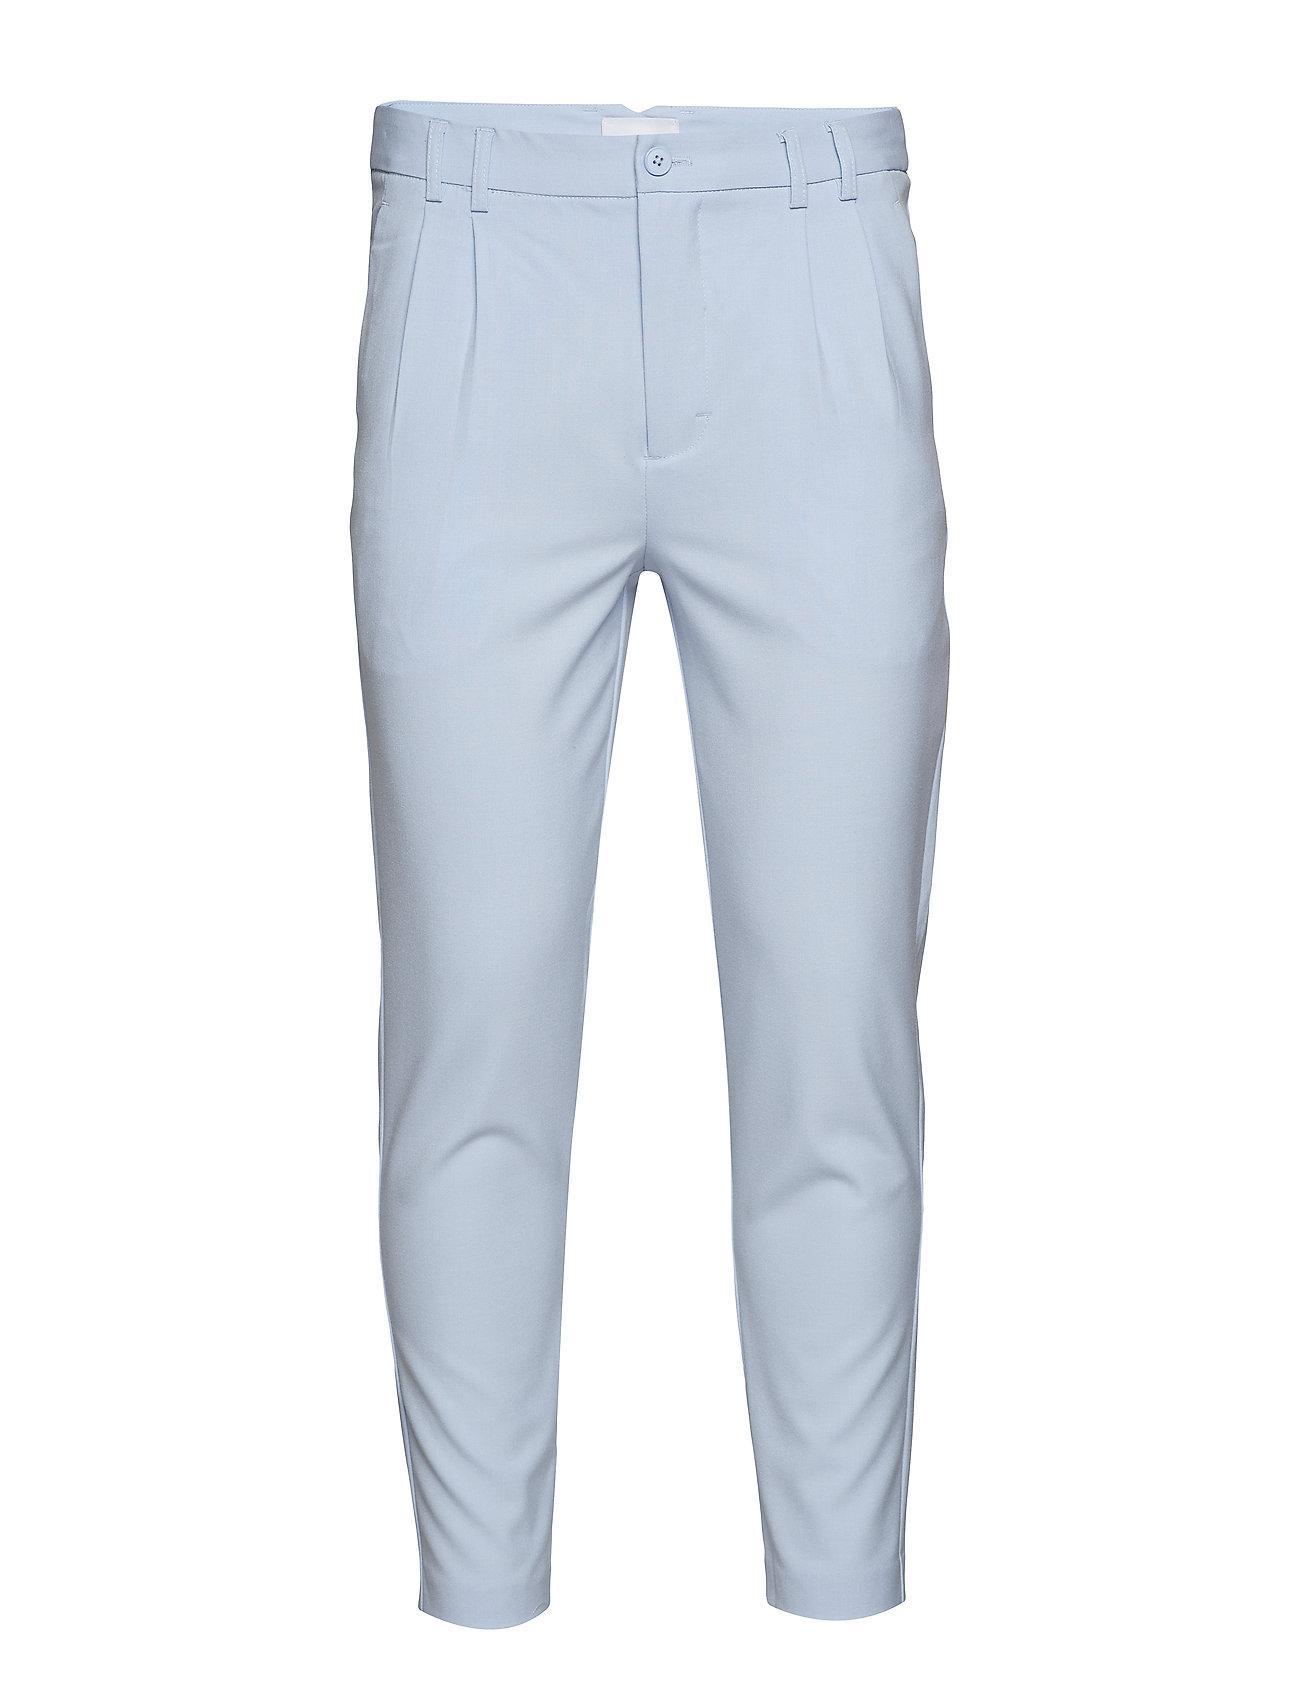 HOLZWEILER OLIVER Trousers SS19 - LIGHT BLUE